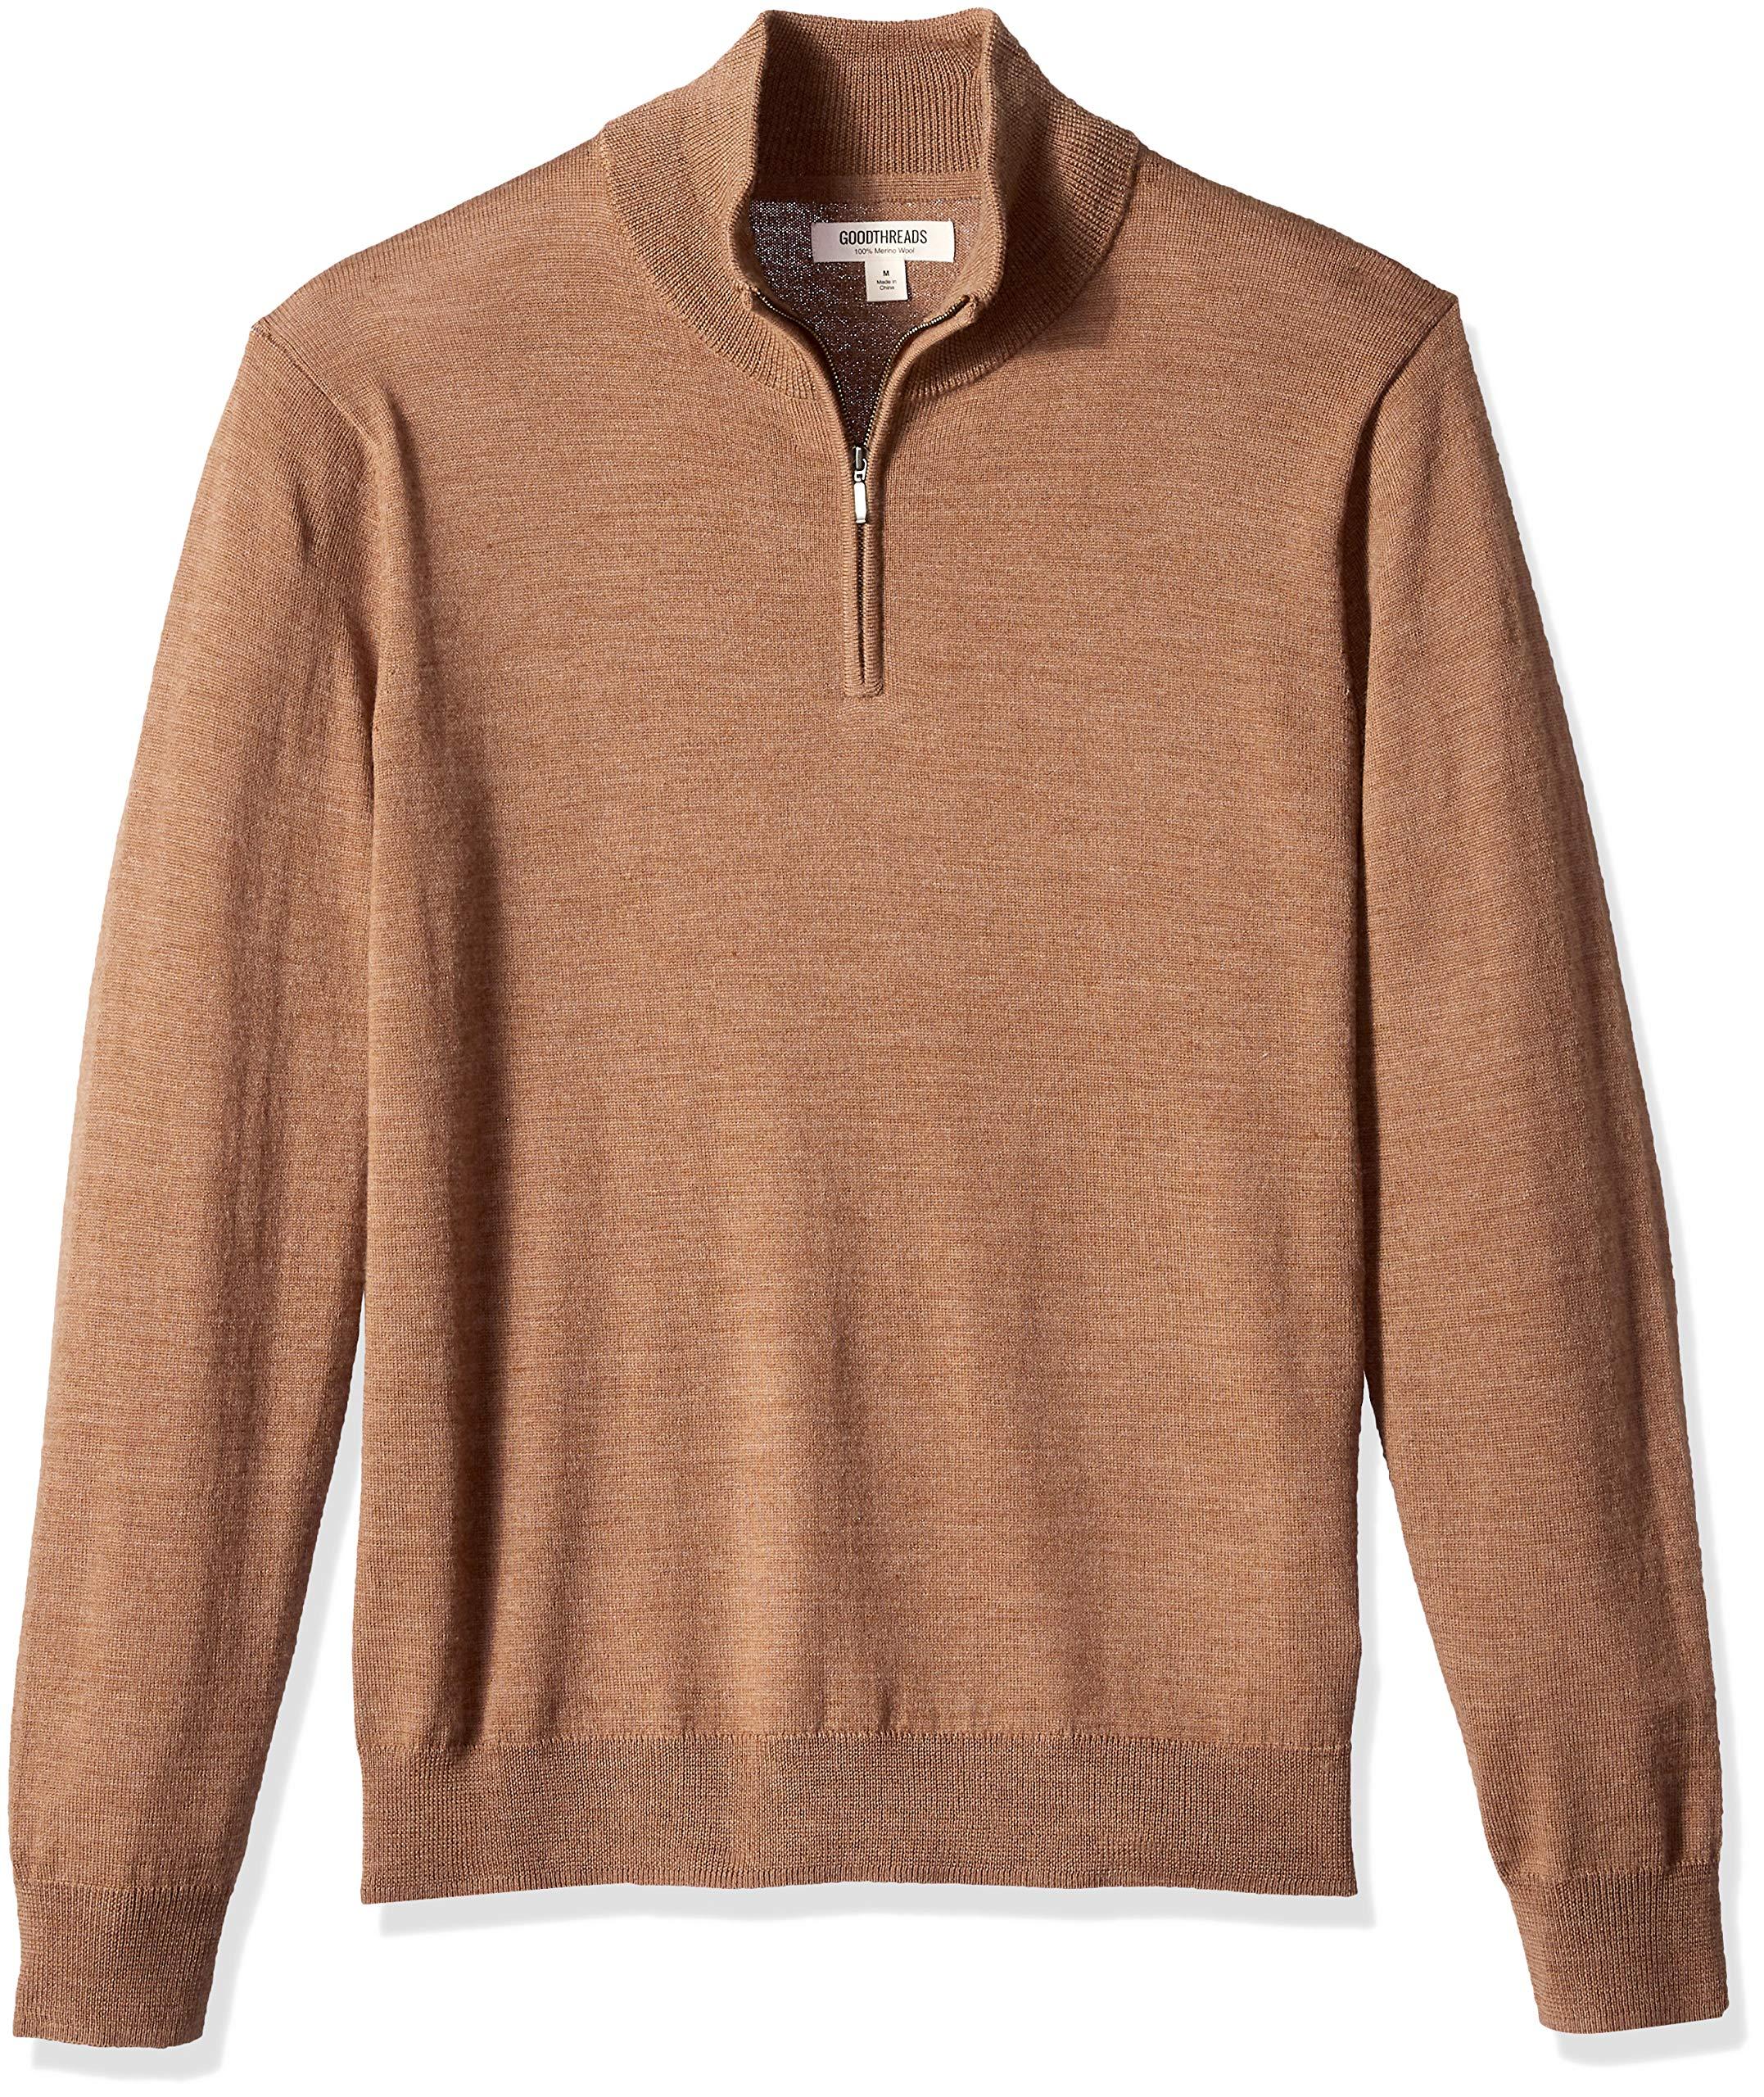 Goodthreads Men's Merino Wool Quarter Zip Sweater, Camel, Small